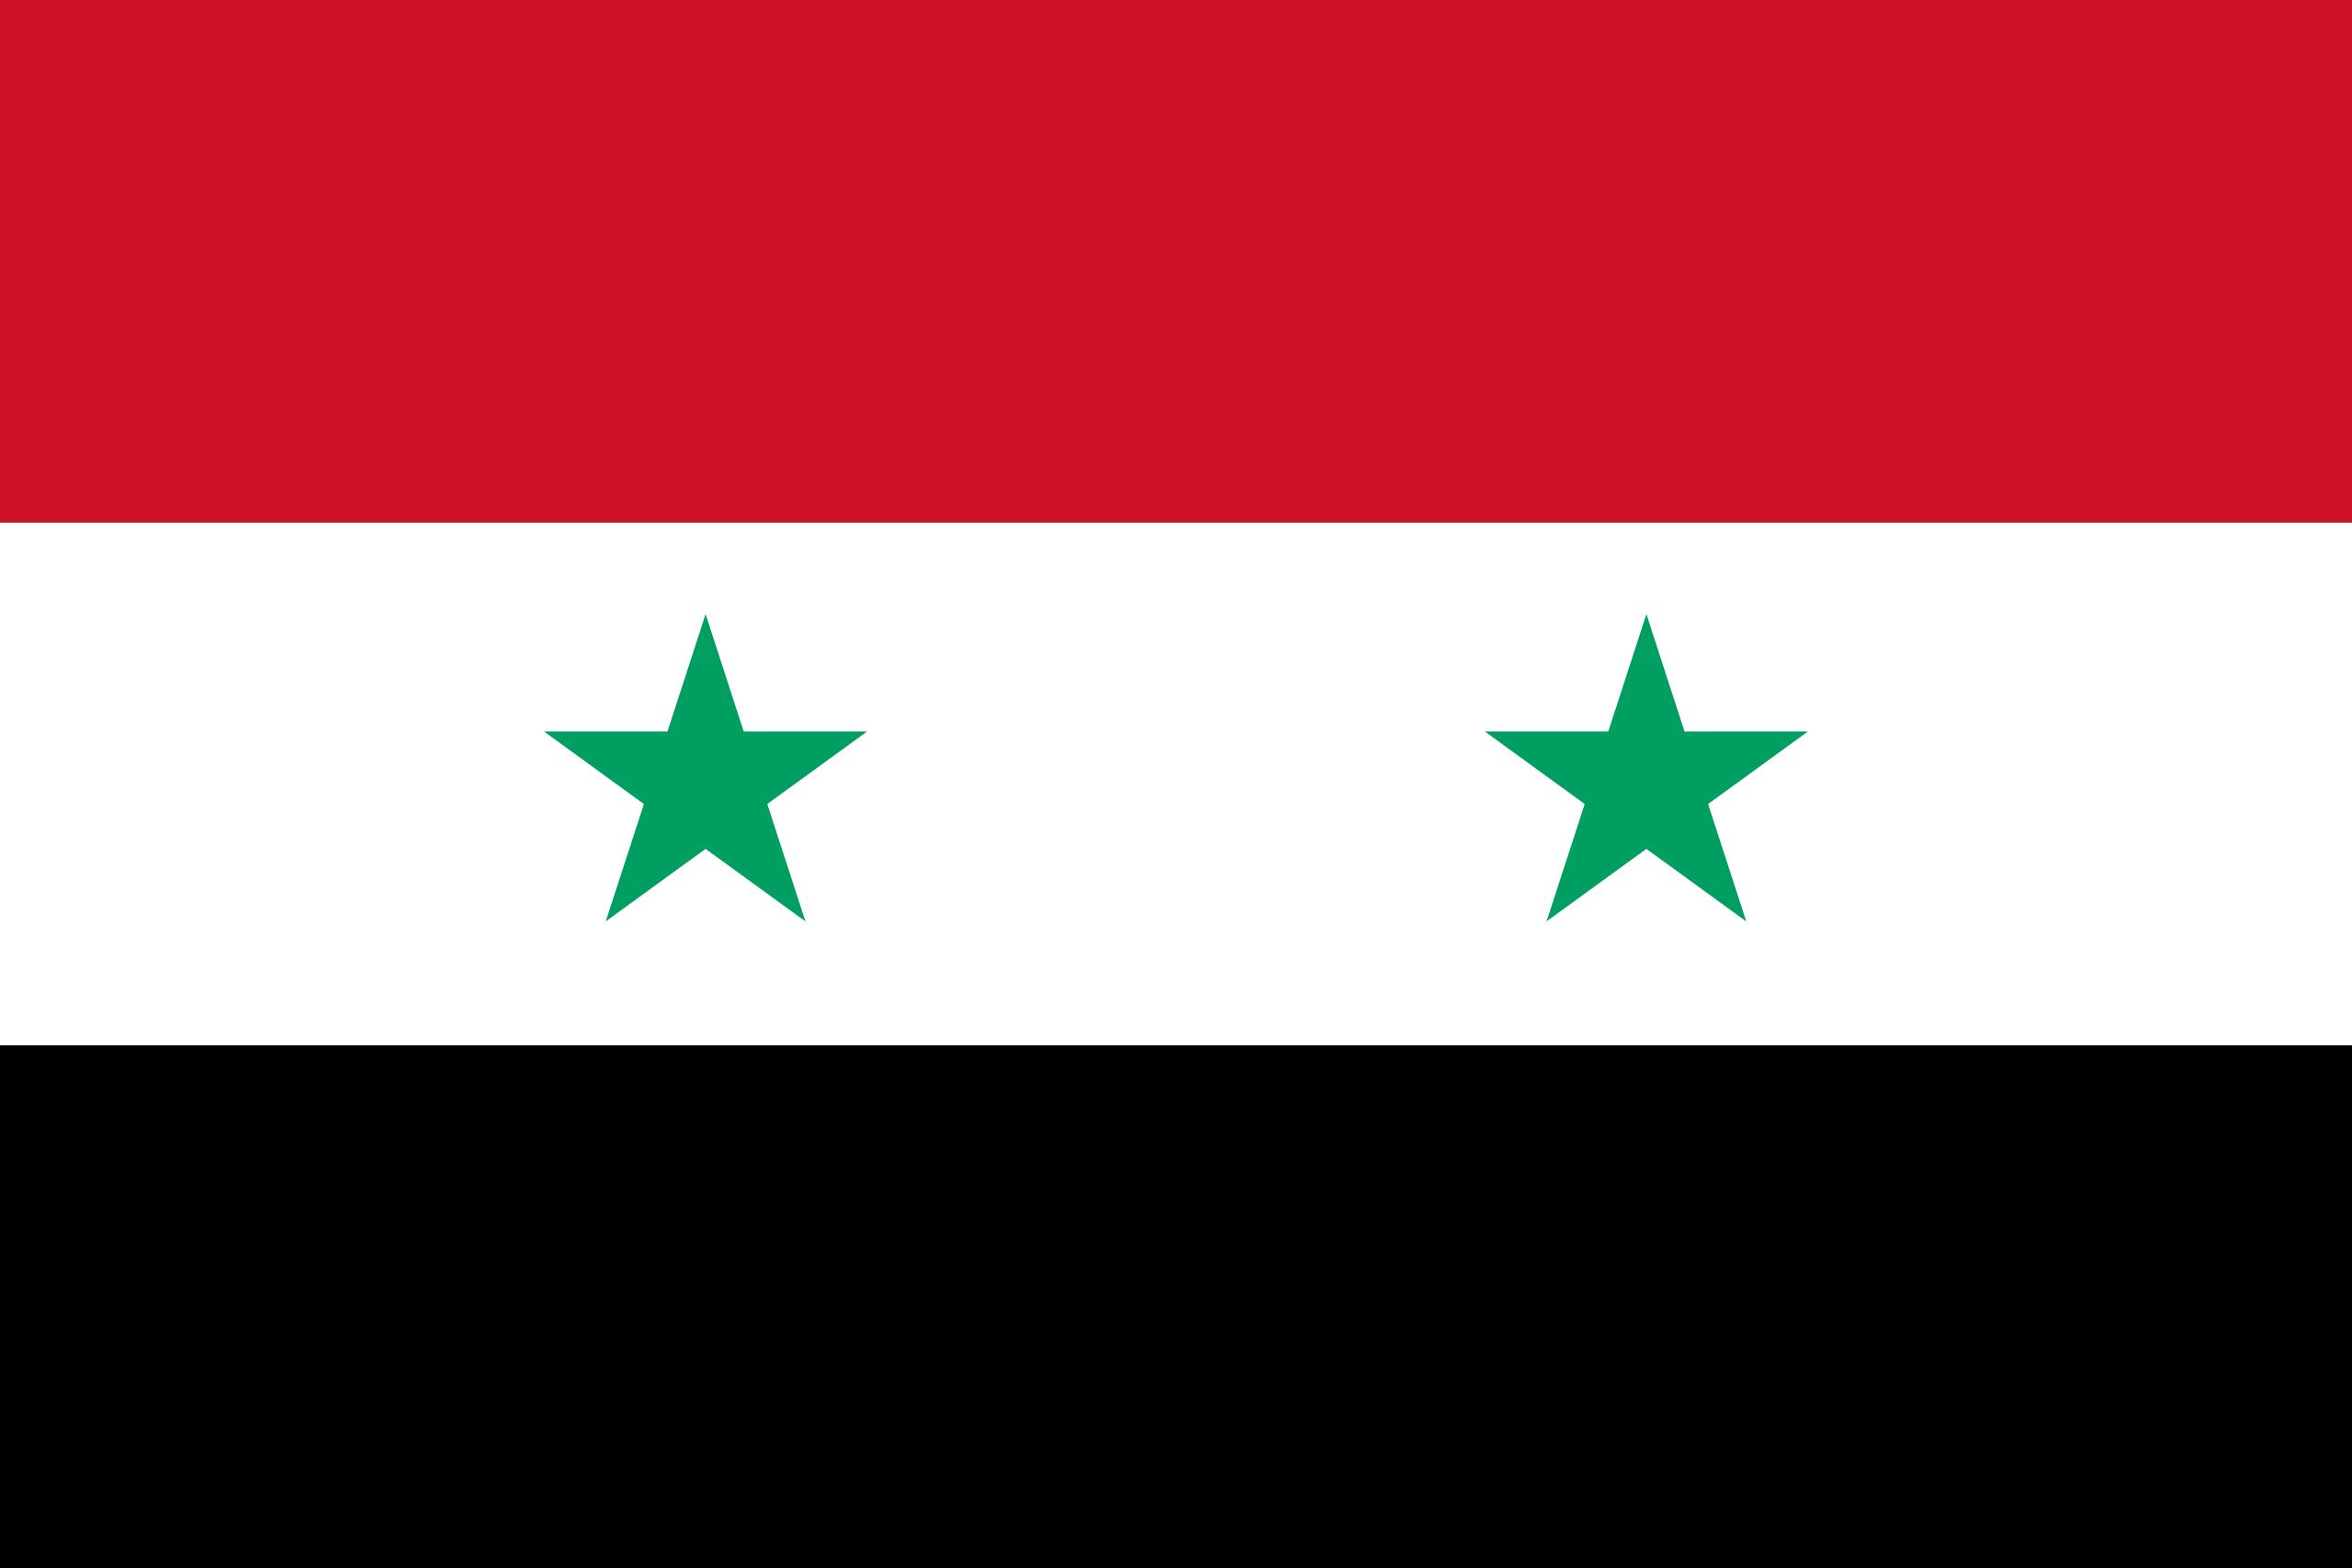 siria, paese, emblema, logo, simbolo - Sfondi HD - Professor-falken.com